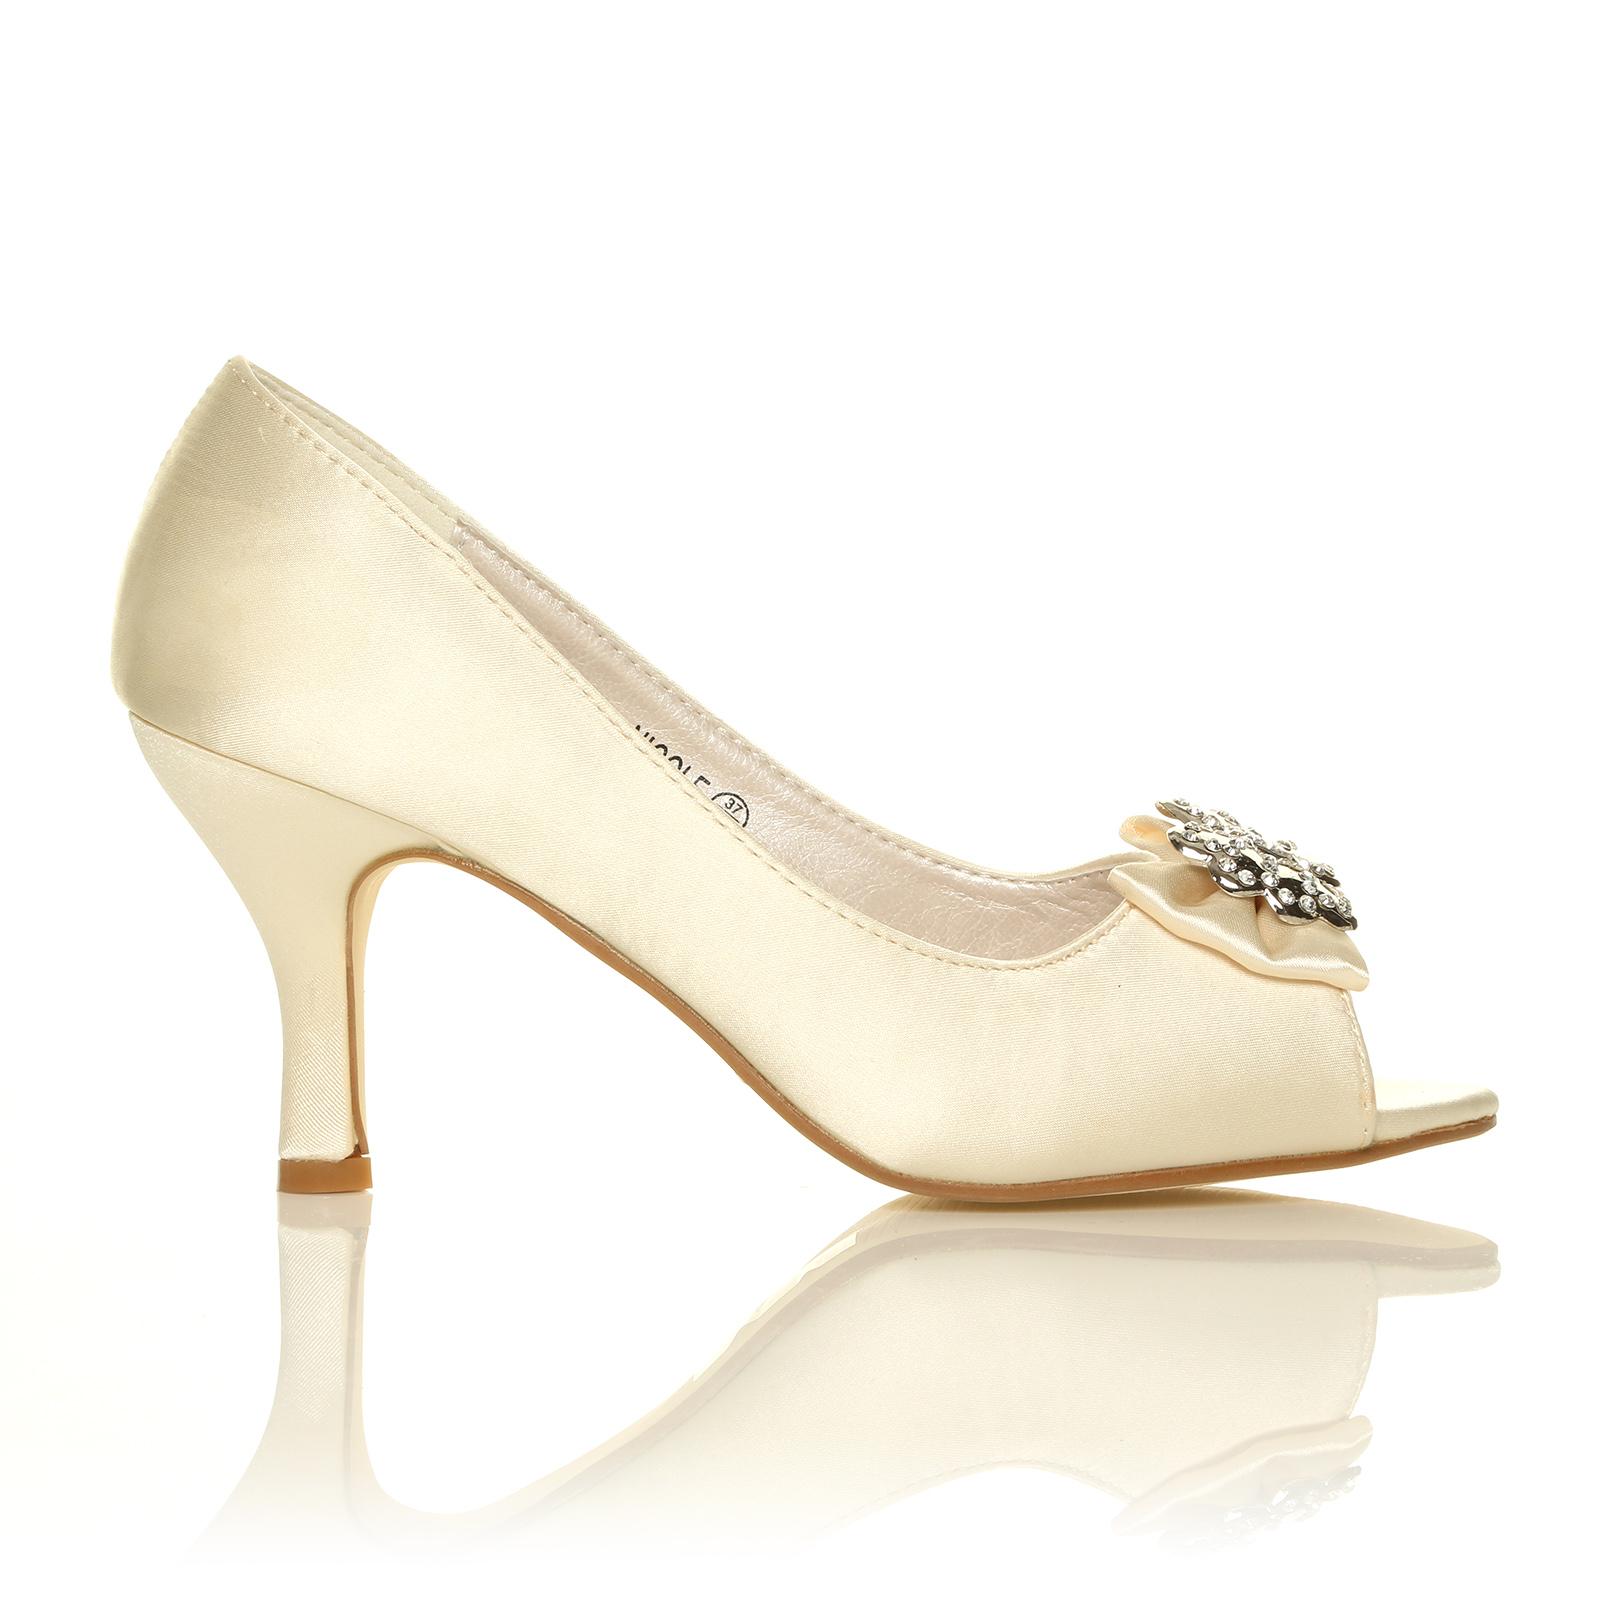 ivory white navy satin low heel bridal prom peep toe